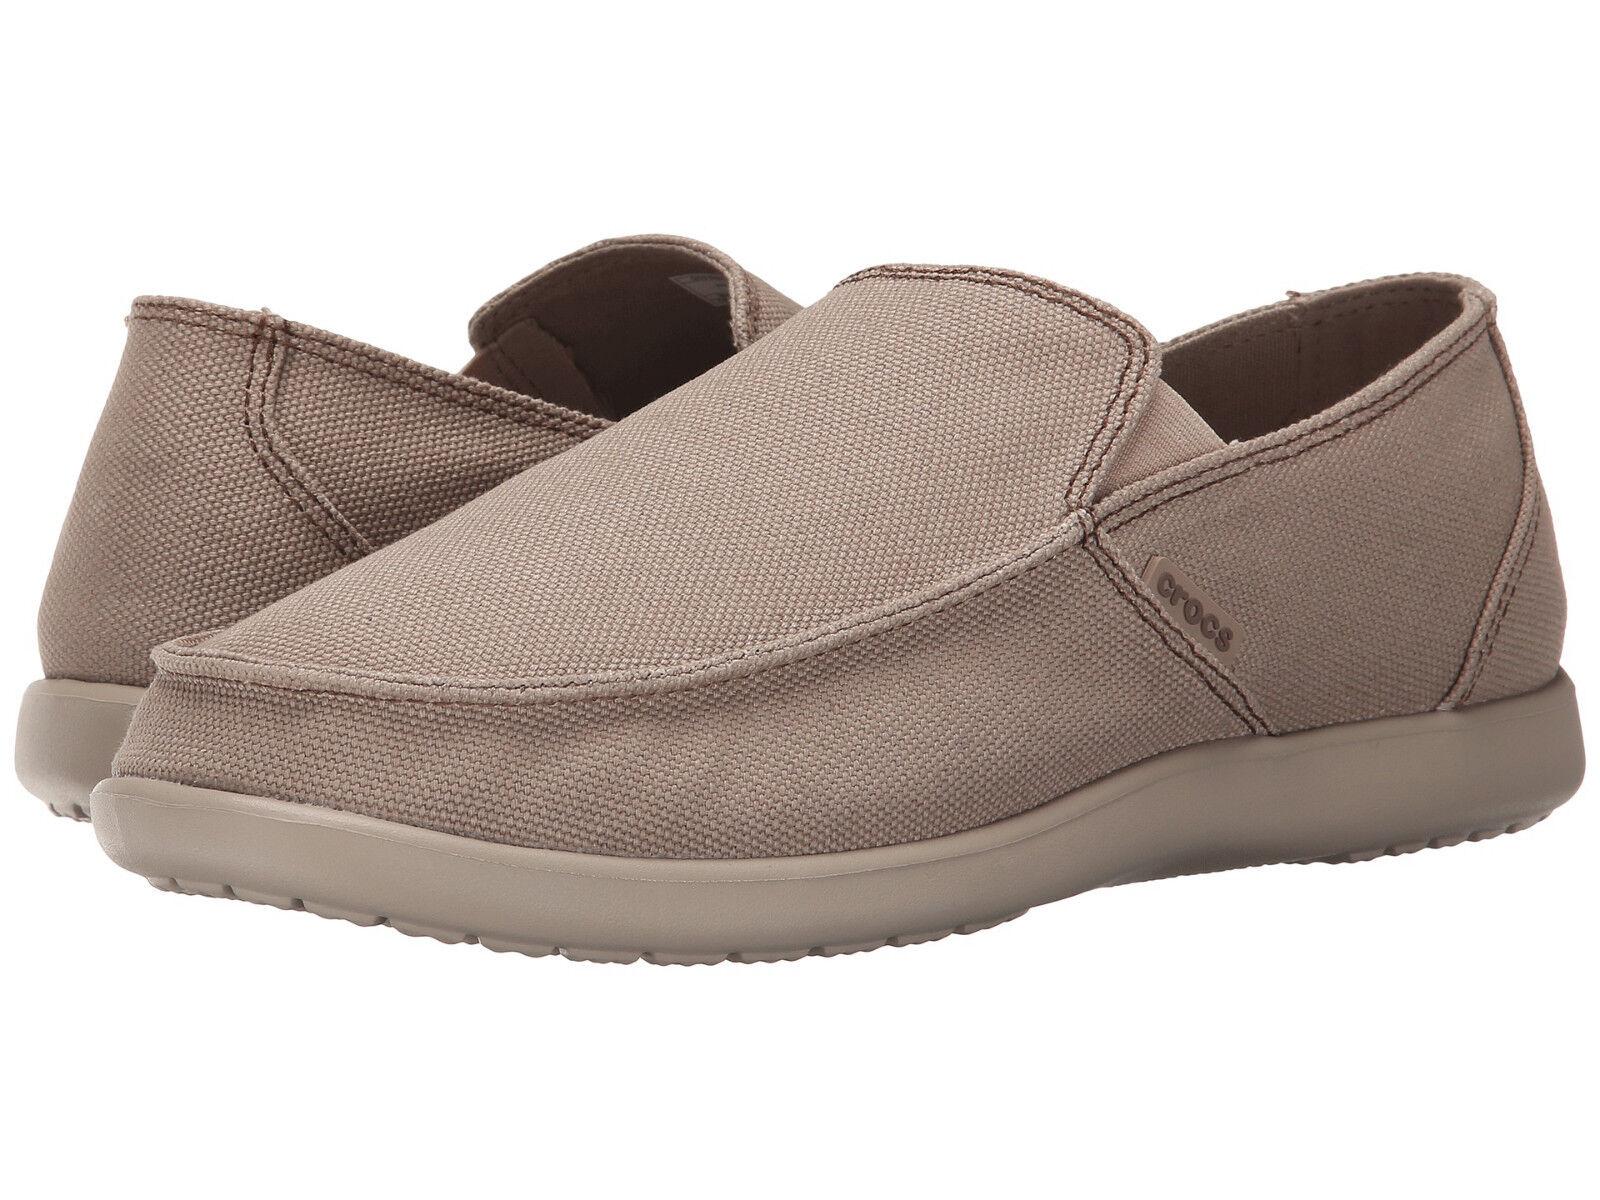 Men Crocs Santa Cruz Clean Out Loafer 202972-2U6 Khaki Cobbes 100% Original New